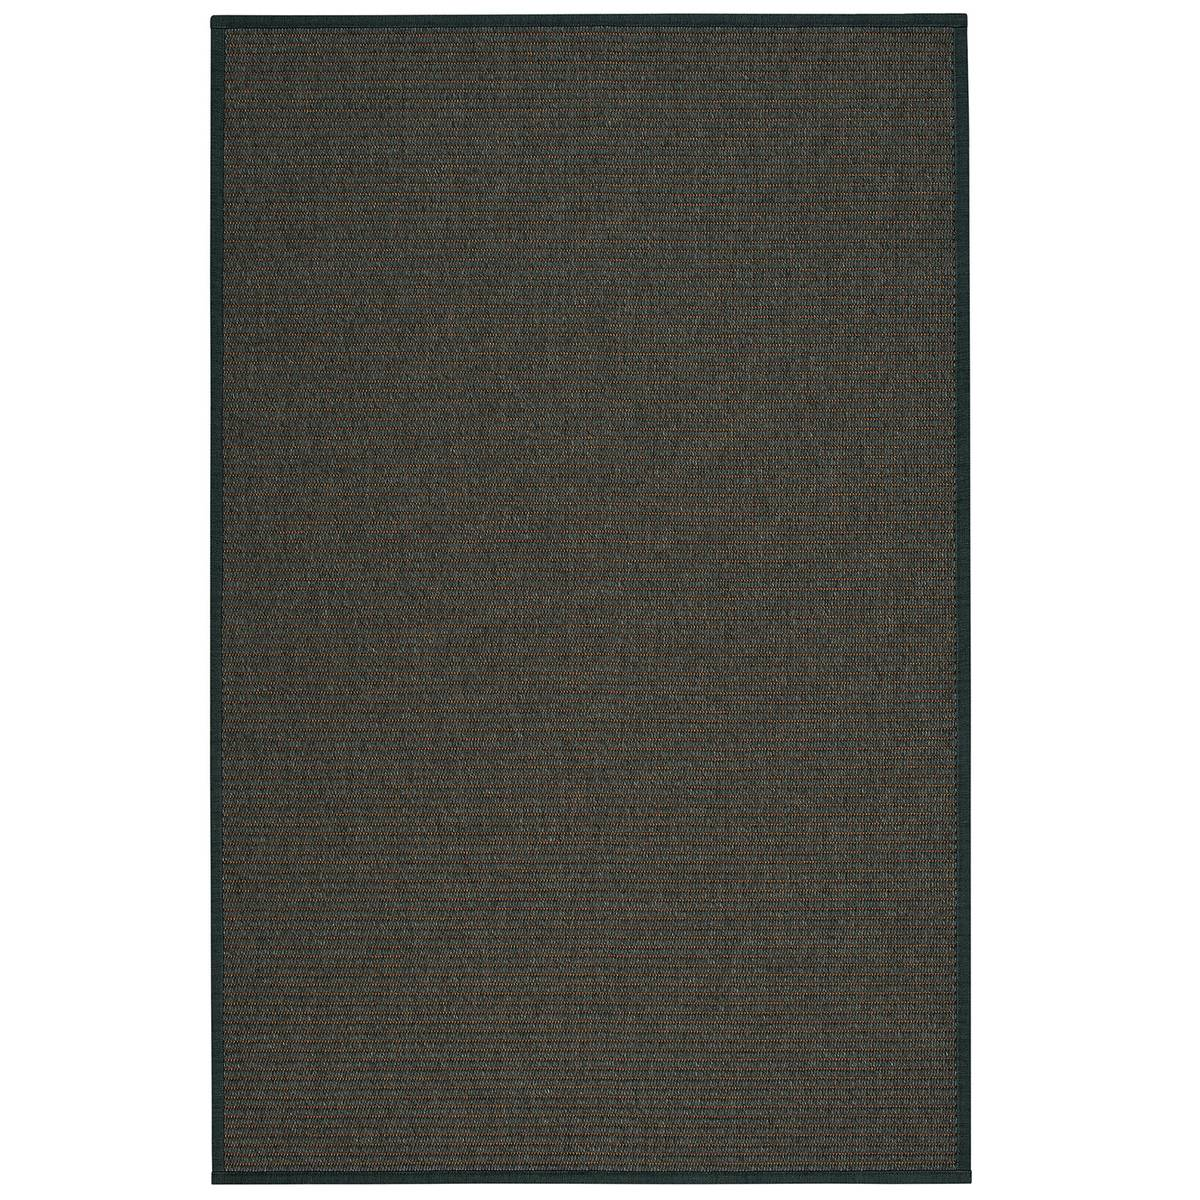 VM Carpet Tunturi matto, musta